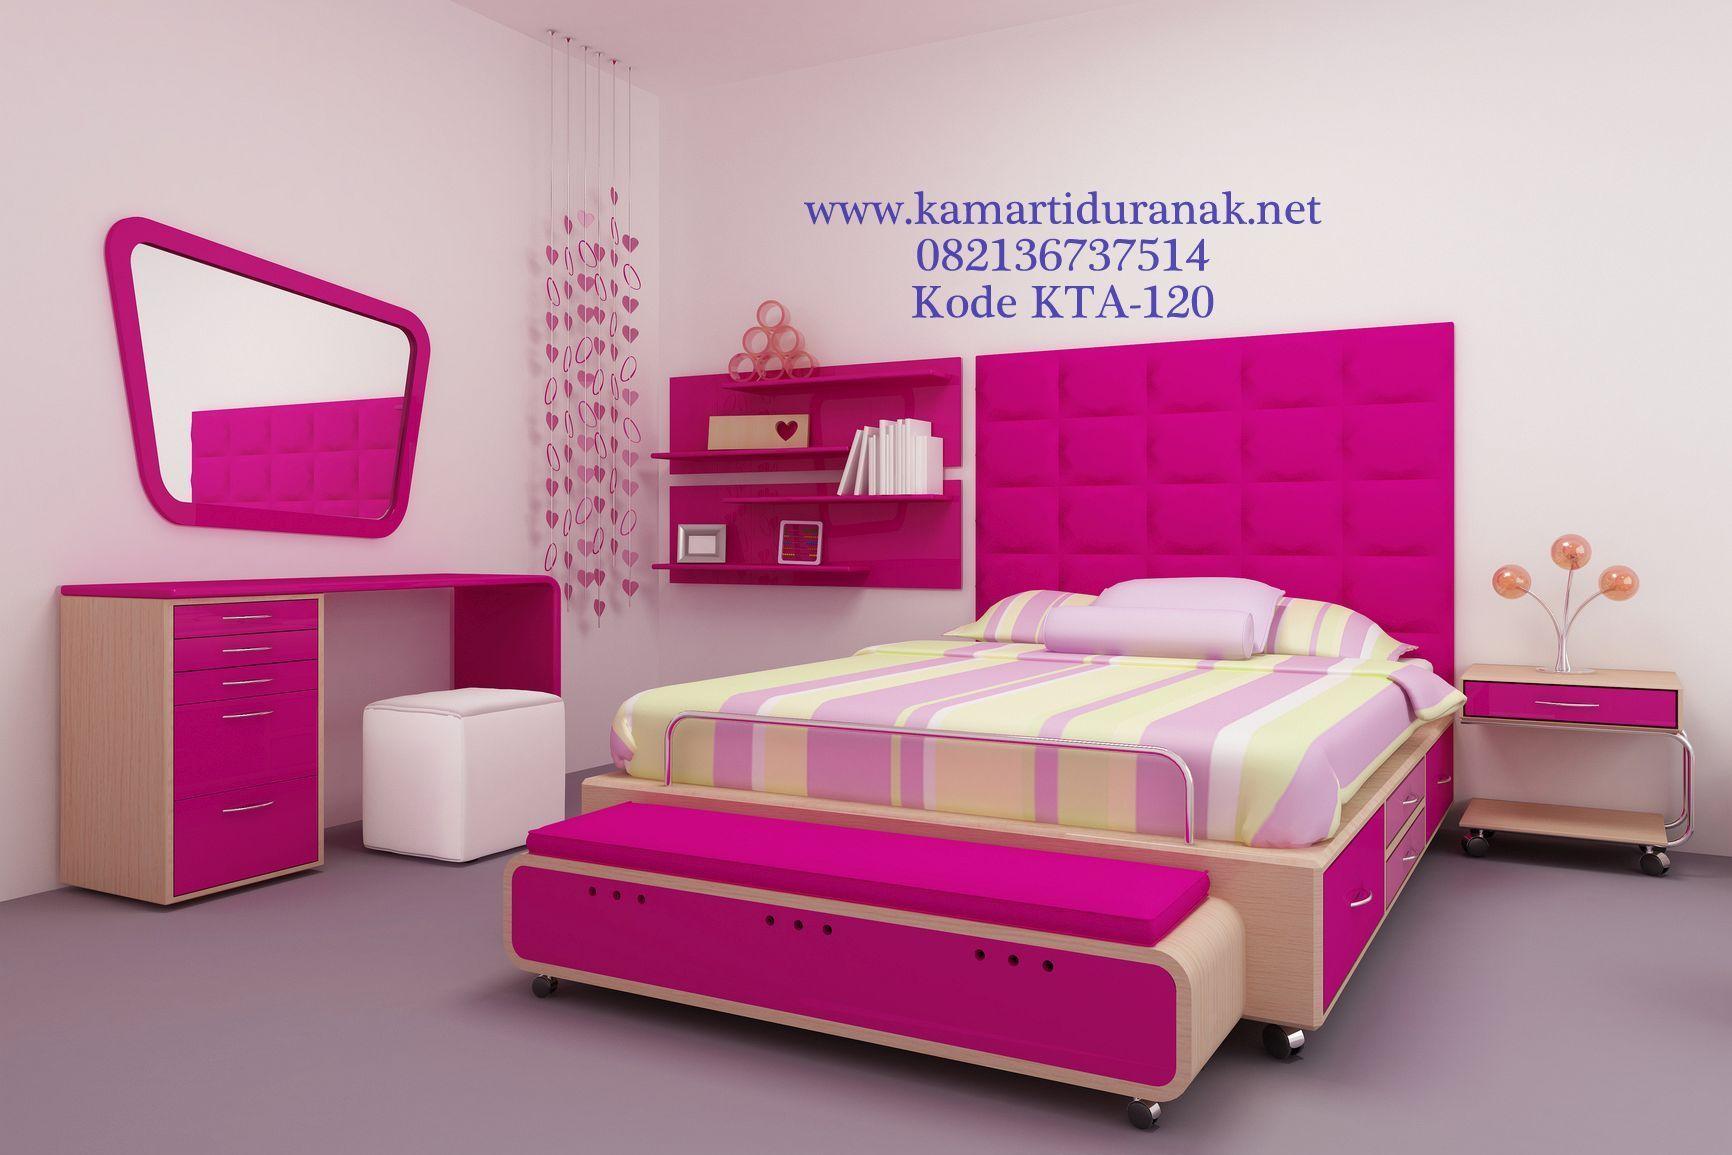 Harga Set Tempat Tidur Remaja Pink Minimalis Modern Interior